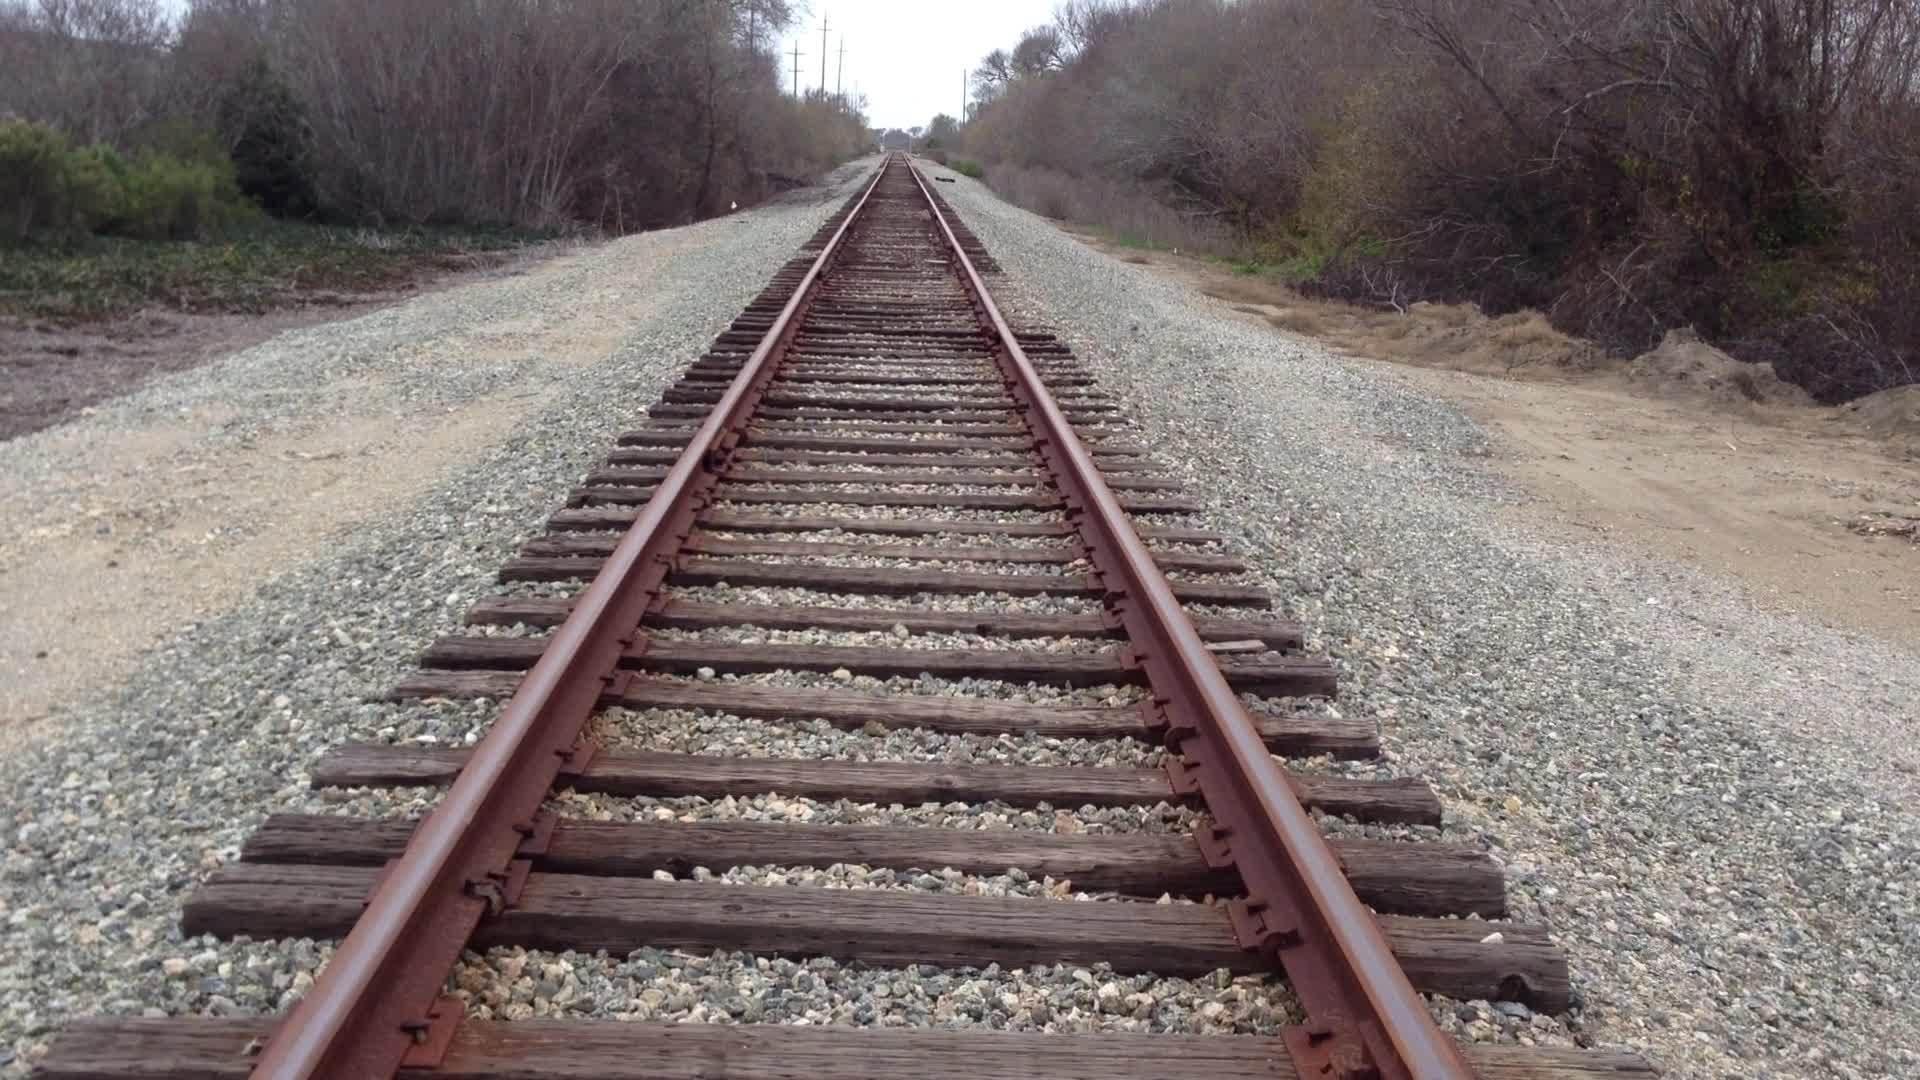 Olympia, WA: Train Tracks Sabotaged To Stop Fracking Equipment - Long Room